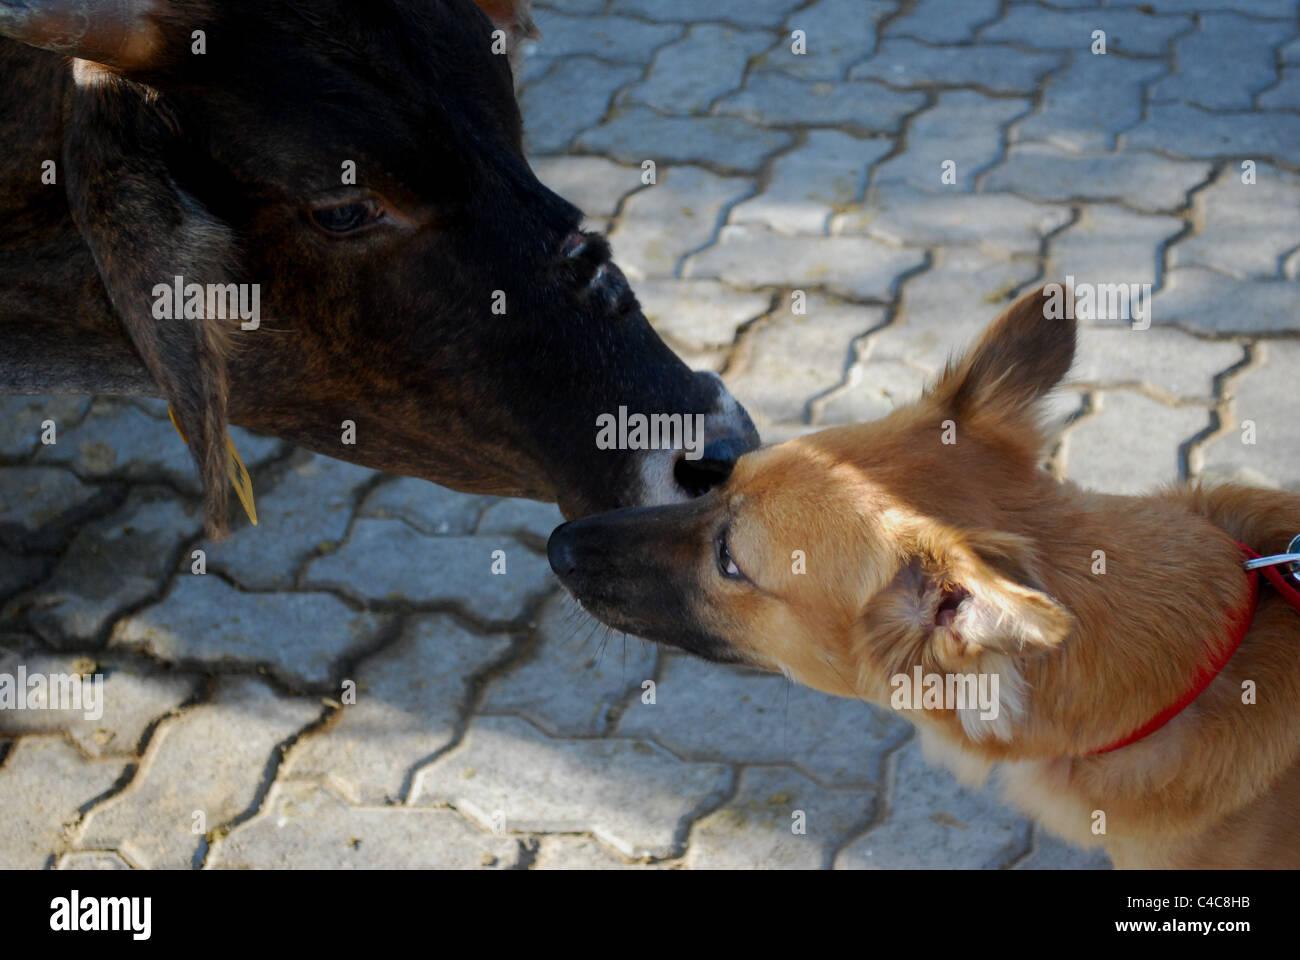 a cow meet dog - Stock Image